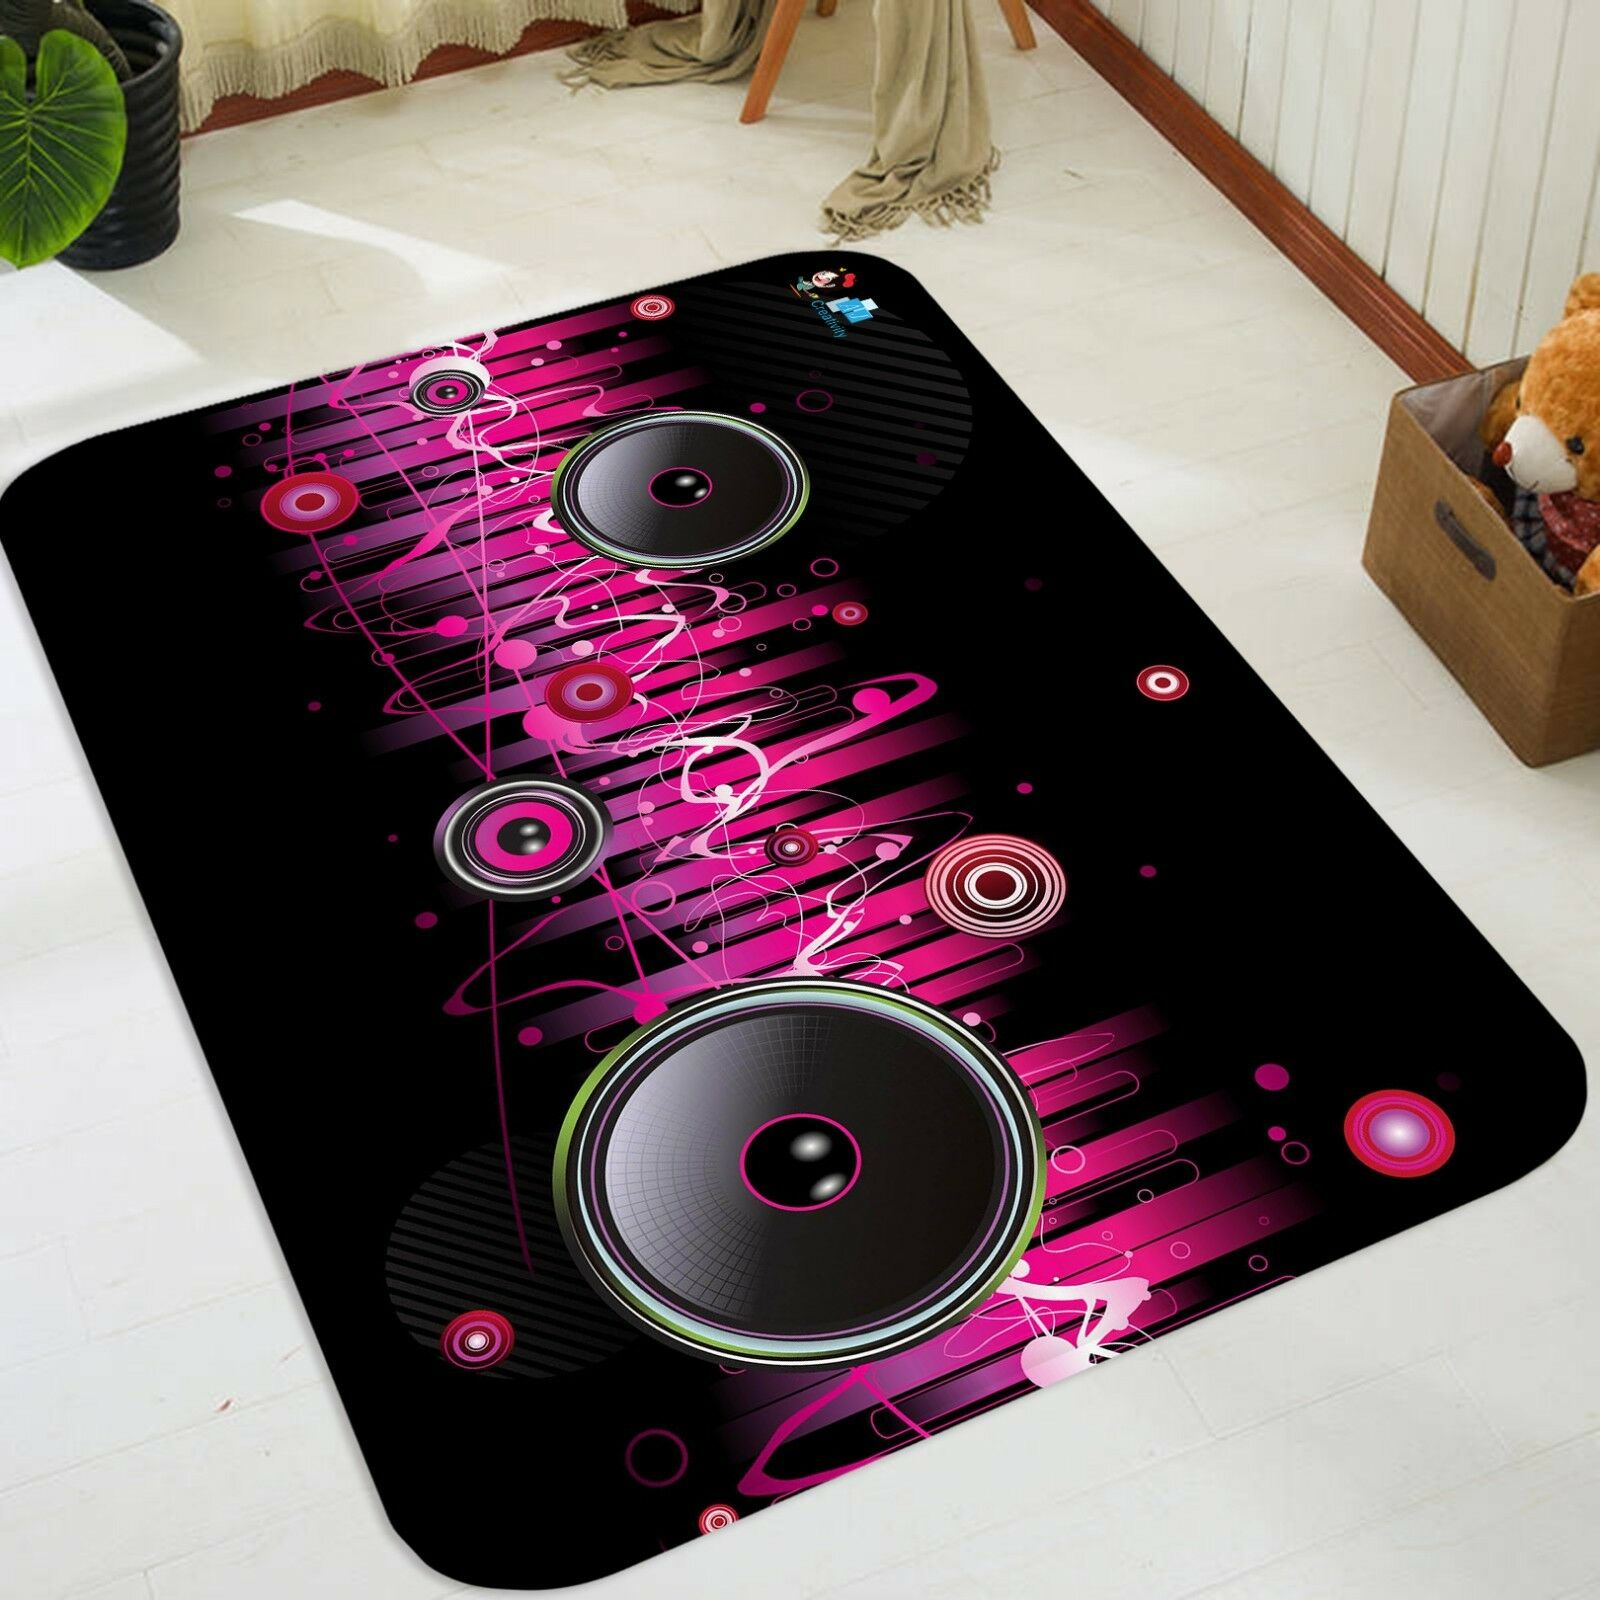 3d altavoces música 13 non-slip Carpet mat quality elegante Carpet de Summer